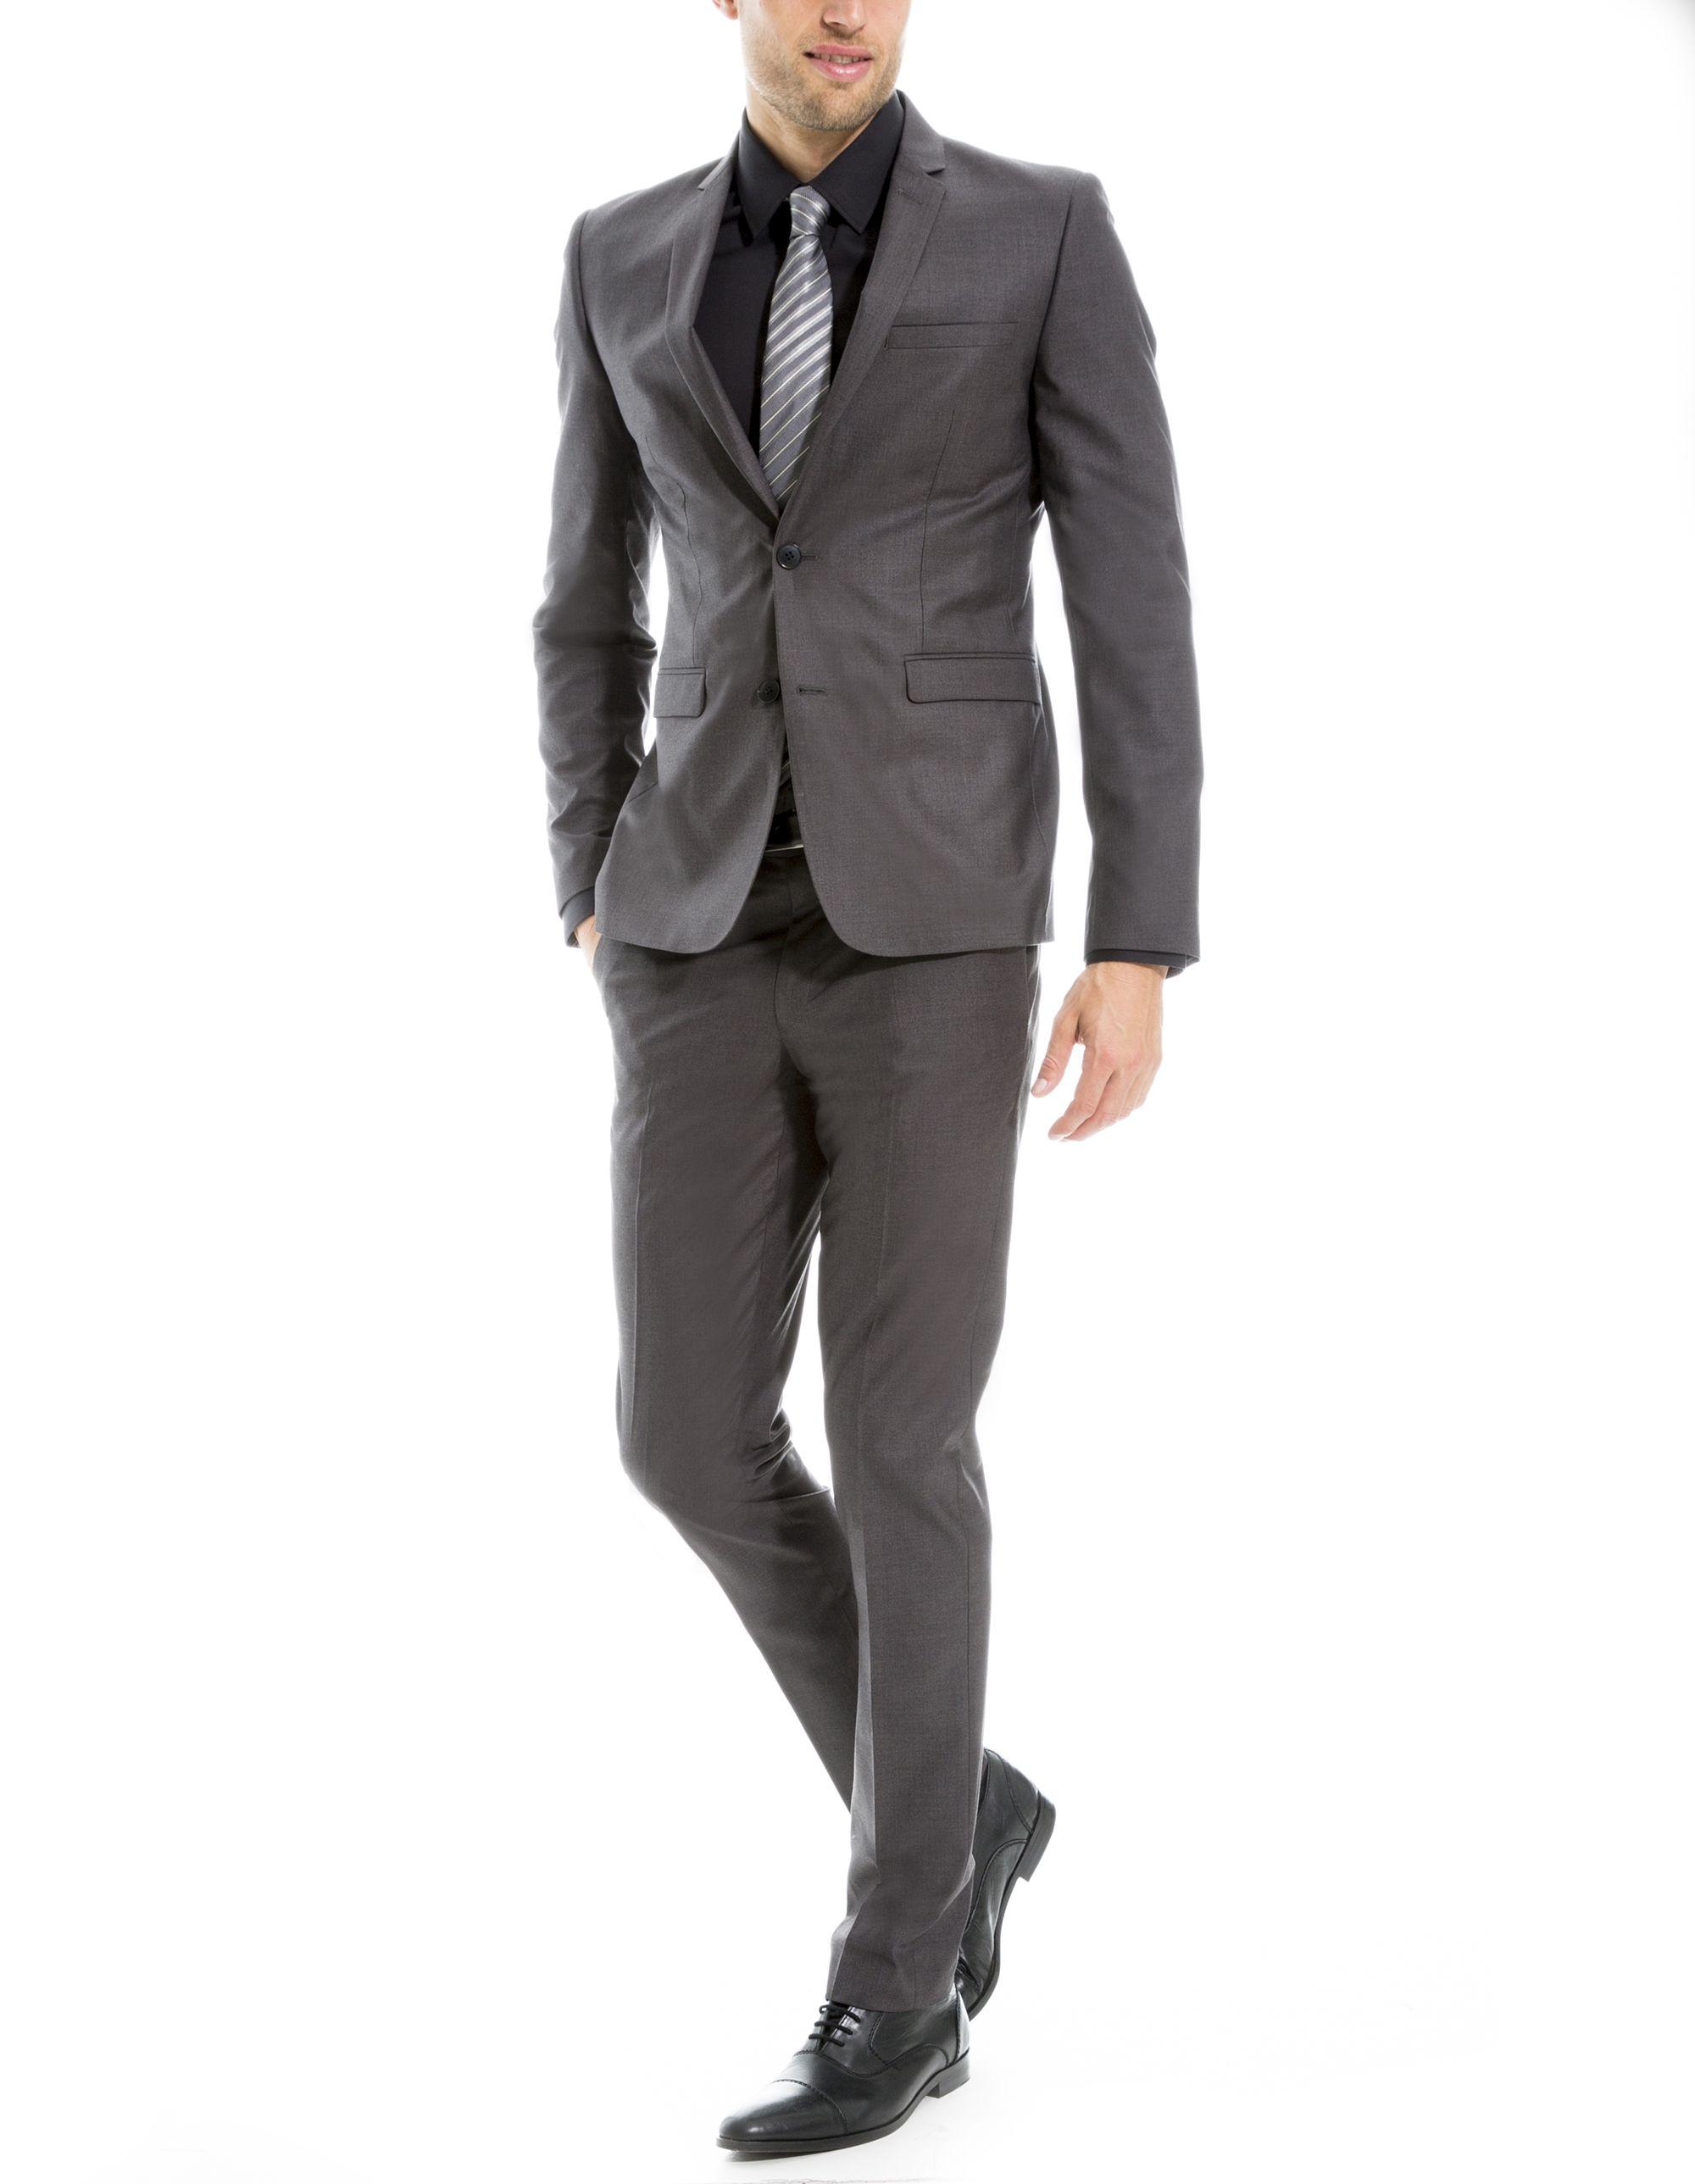 Costume gris easy slim - Costume complet Homme - Brice-FR | Dress ...